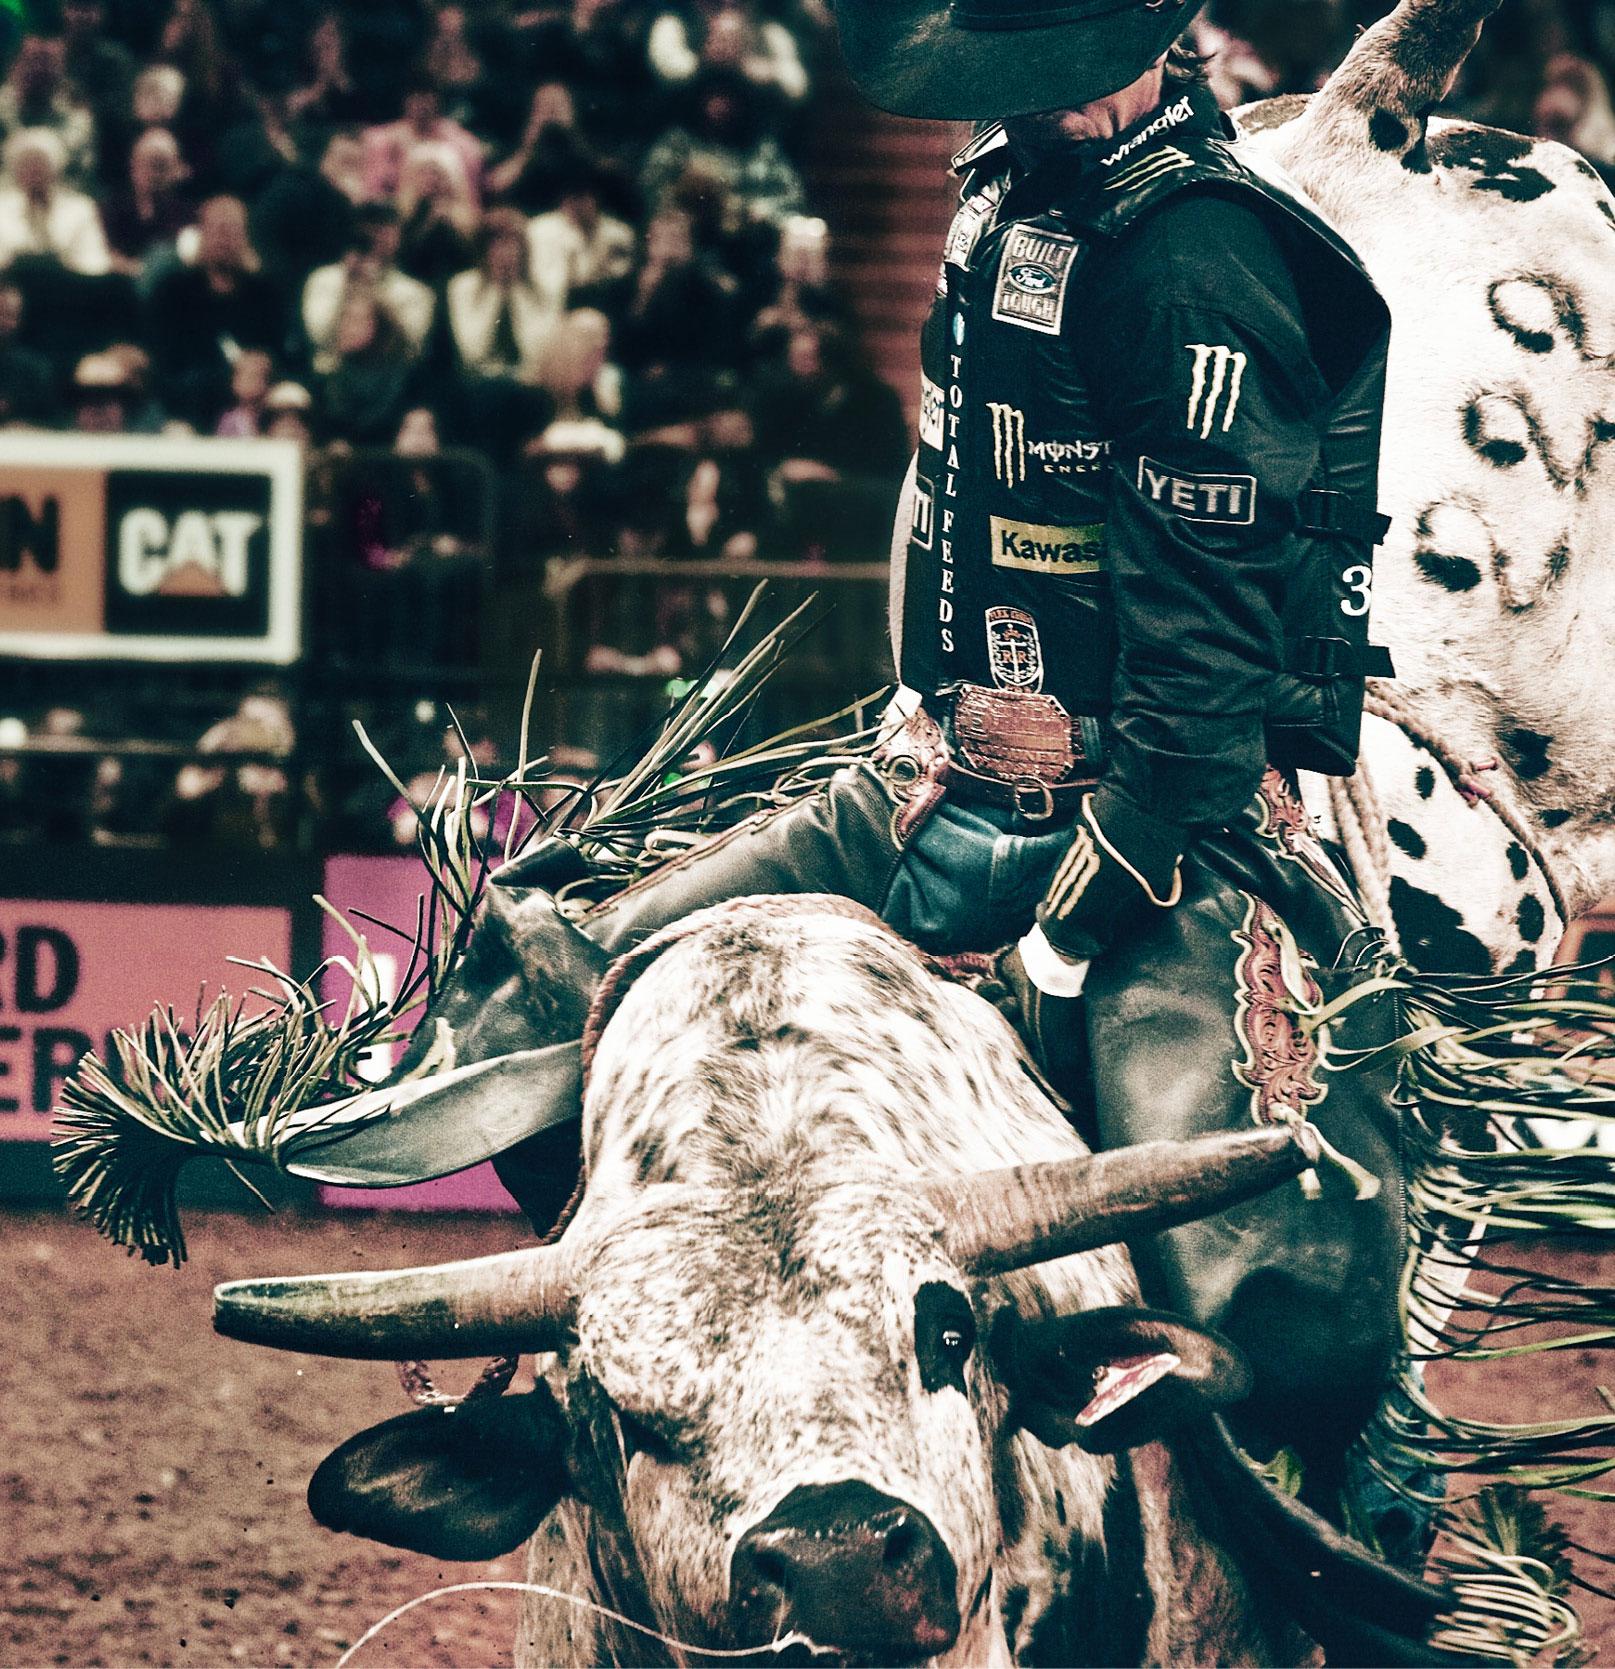 2f6b2042 The Baddest Bull Ride Has a Secret to Success: Always Pick the Baddest Bull